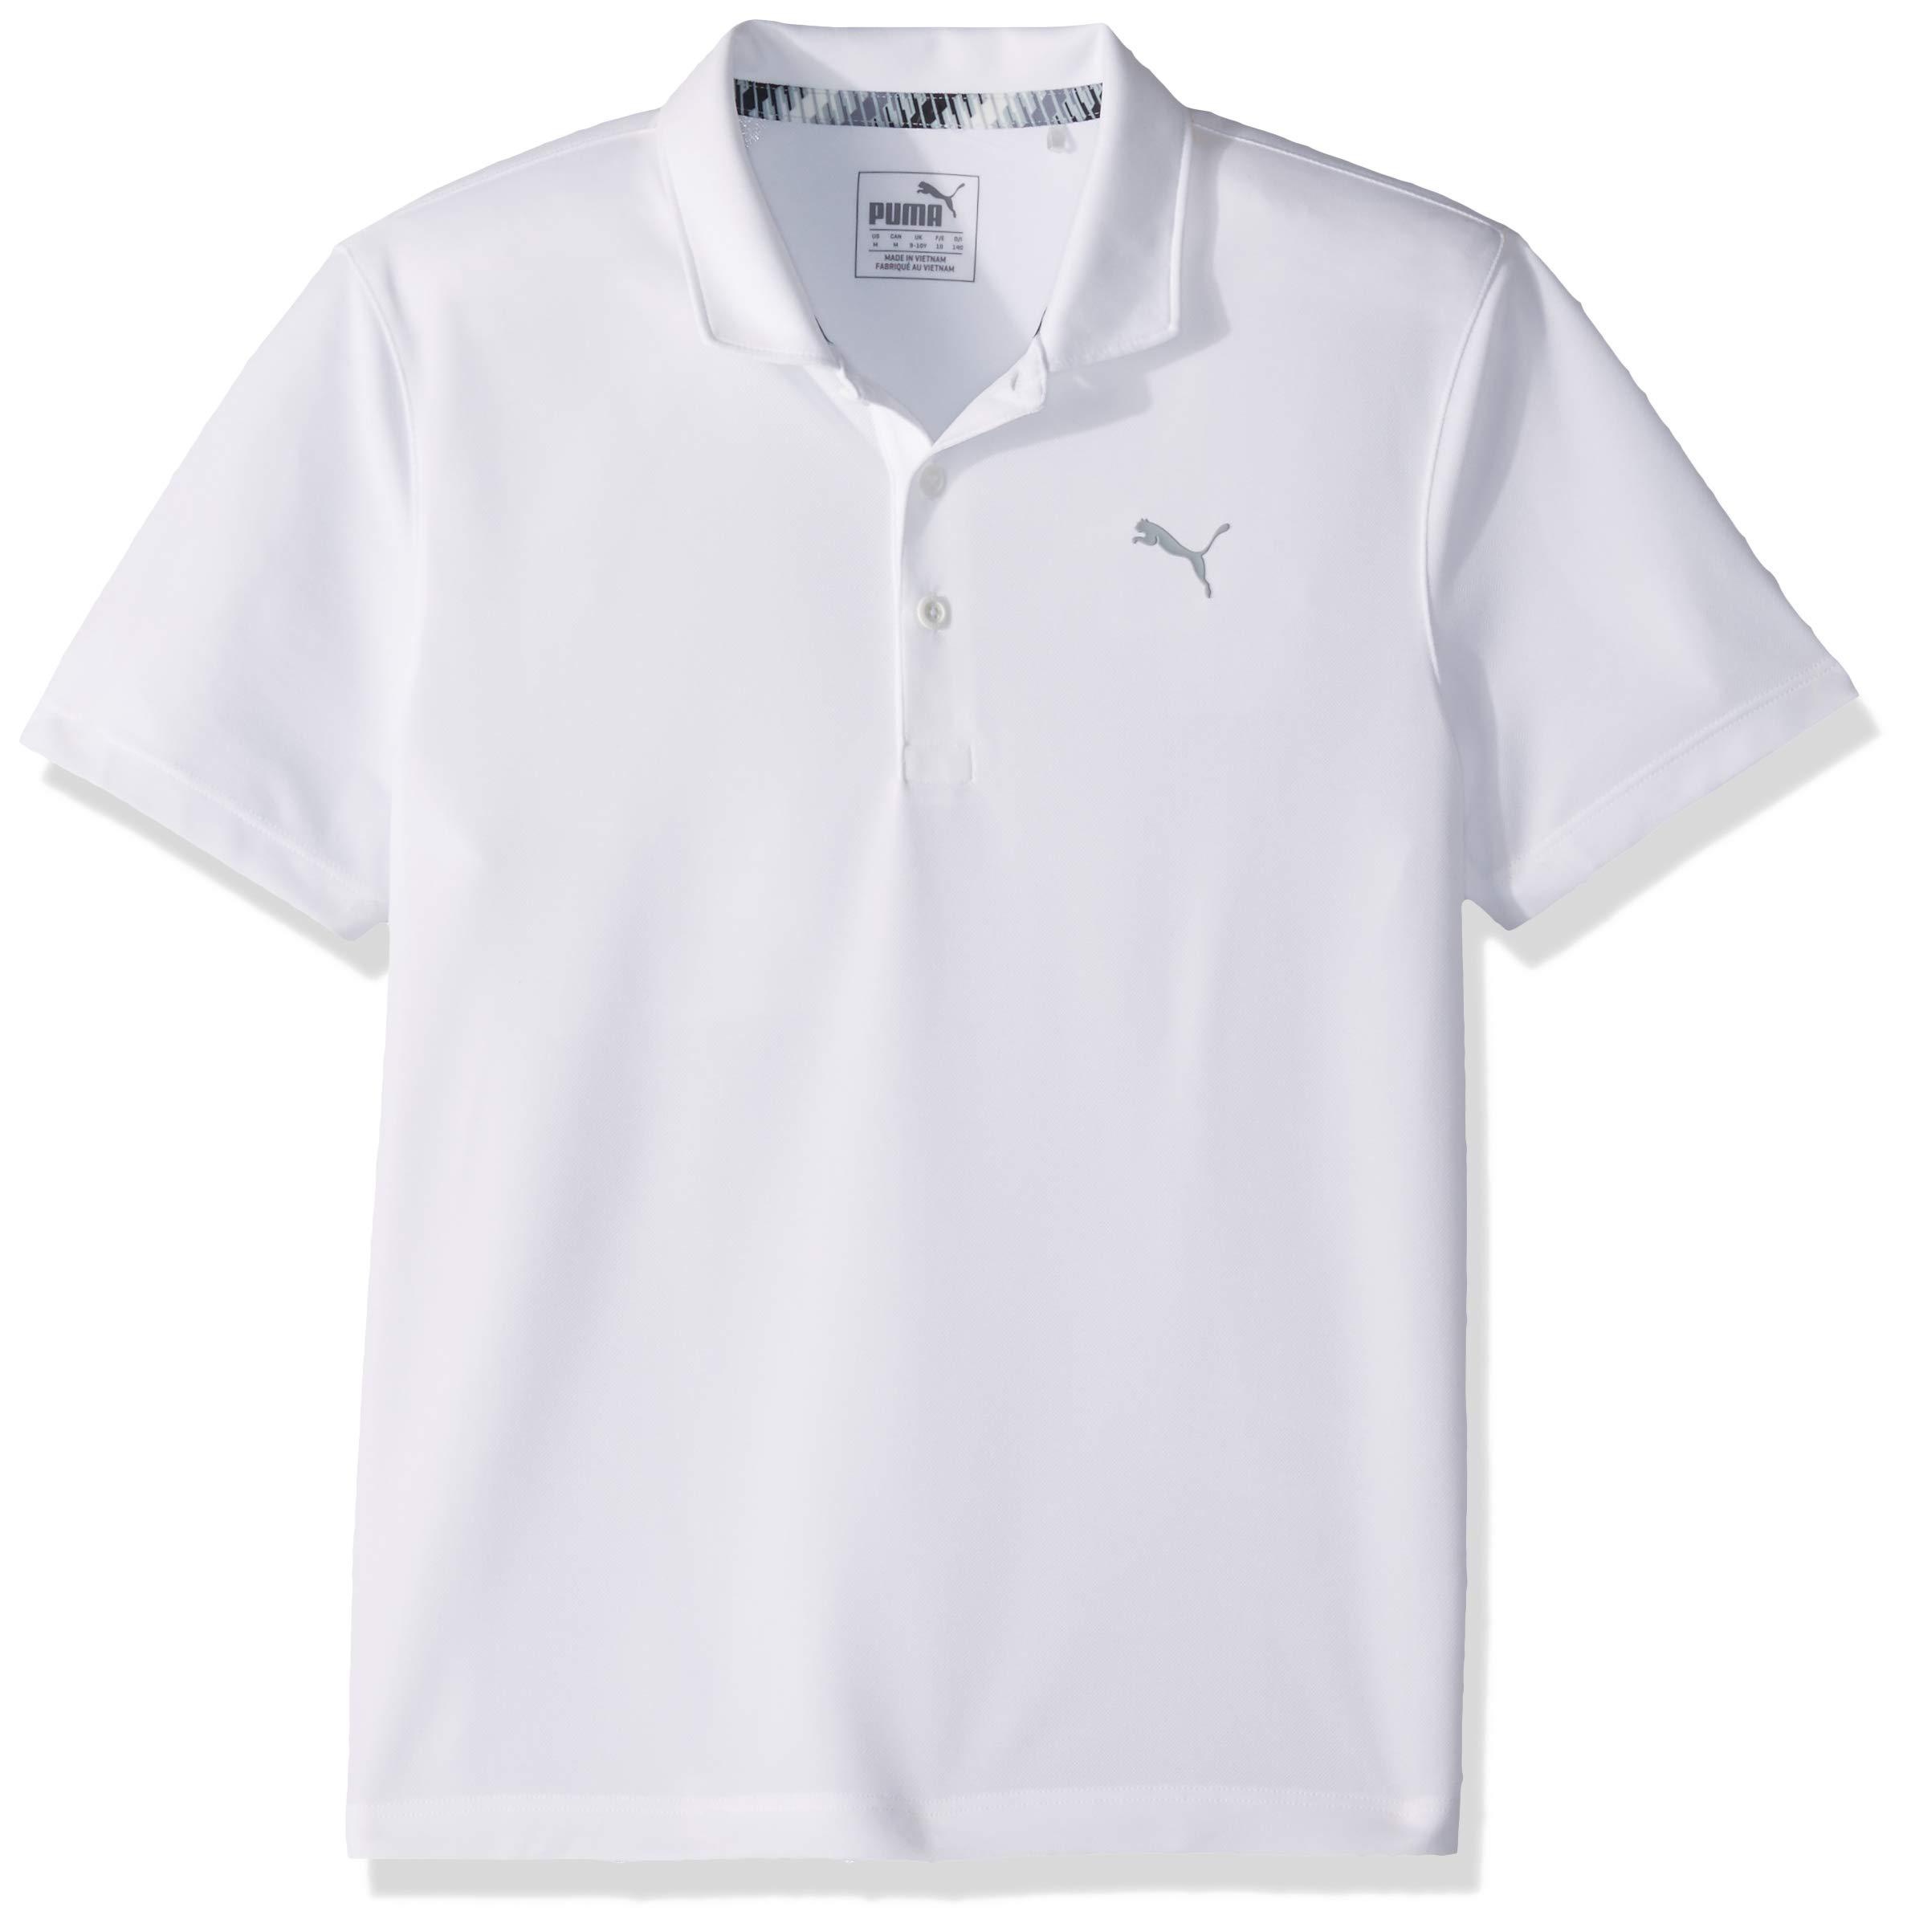 Puma Golf Boys 2019 Polo, Bright White, x Small